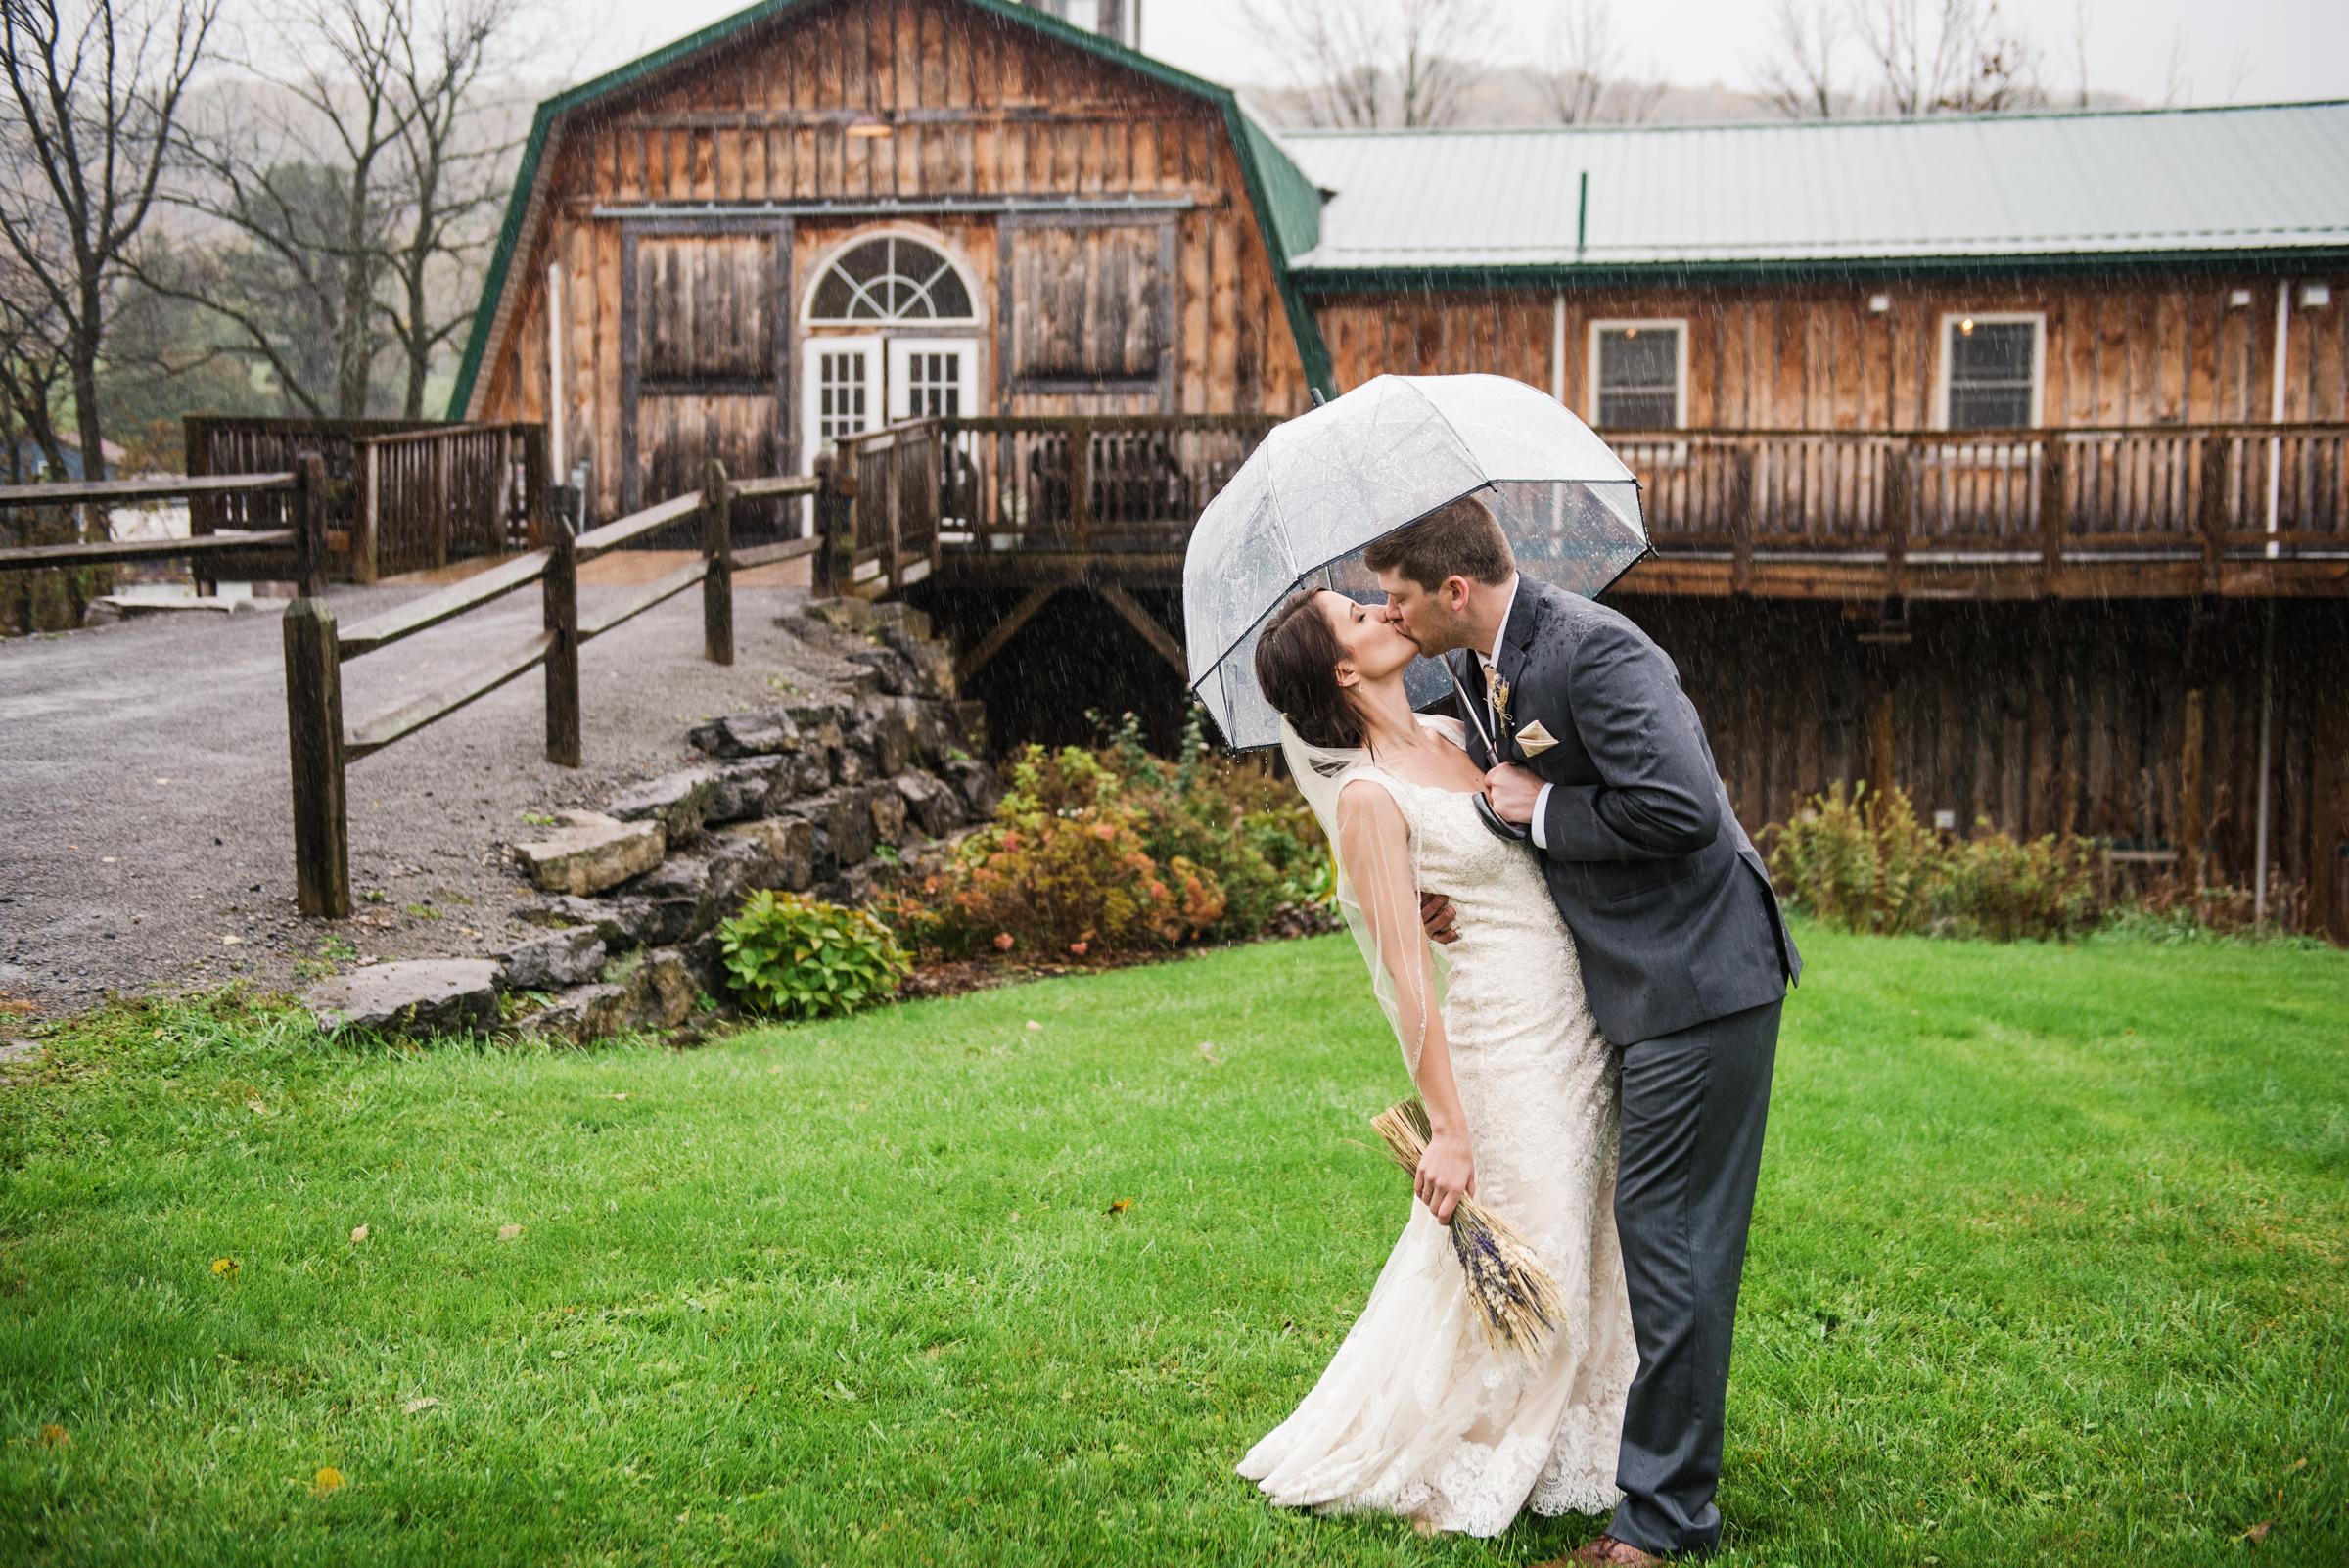 Wolf_Oak_Acres_Central_NY_Wedding_JILL_STUDIO_Rochester_NY_Photographer_DSC_7556.jpg